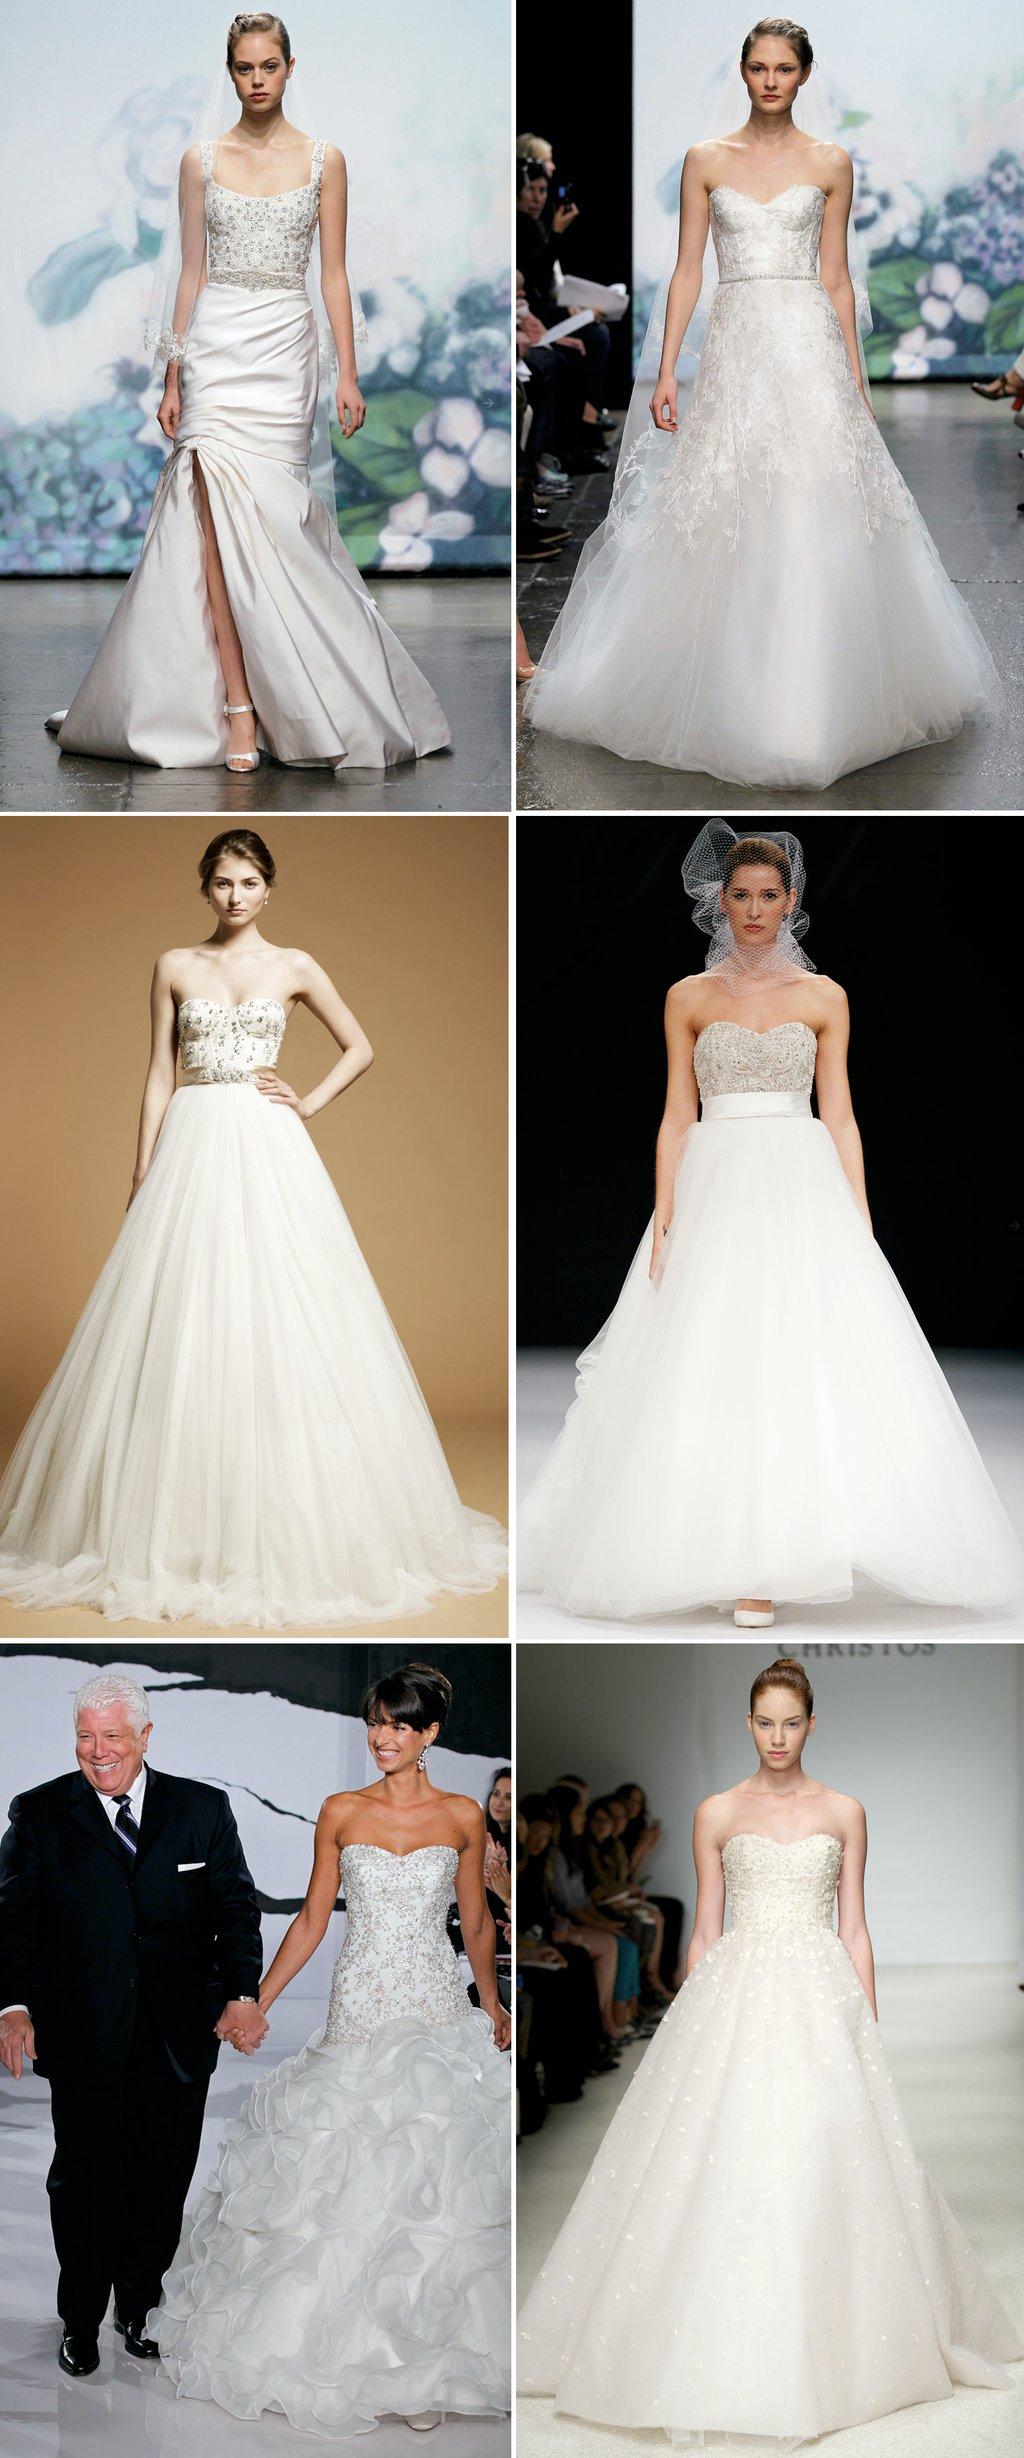 2012-wedding-dresses-corset-bodices-mermaid-ballgown-a-line.full